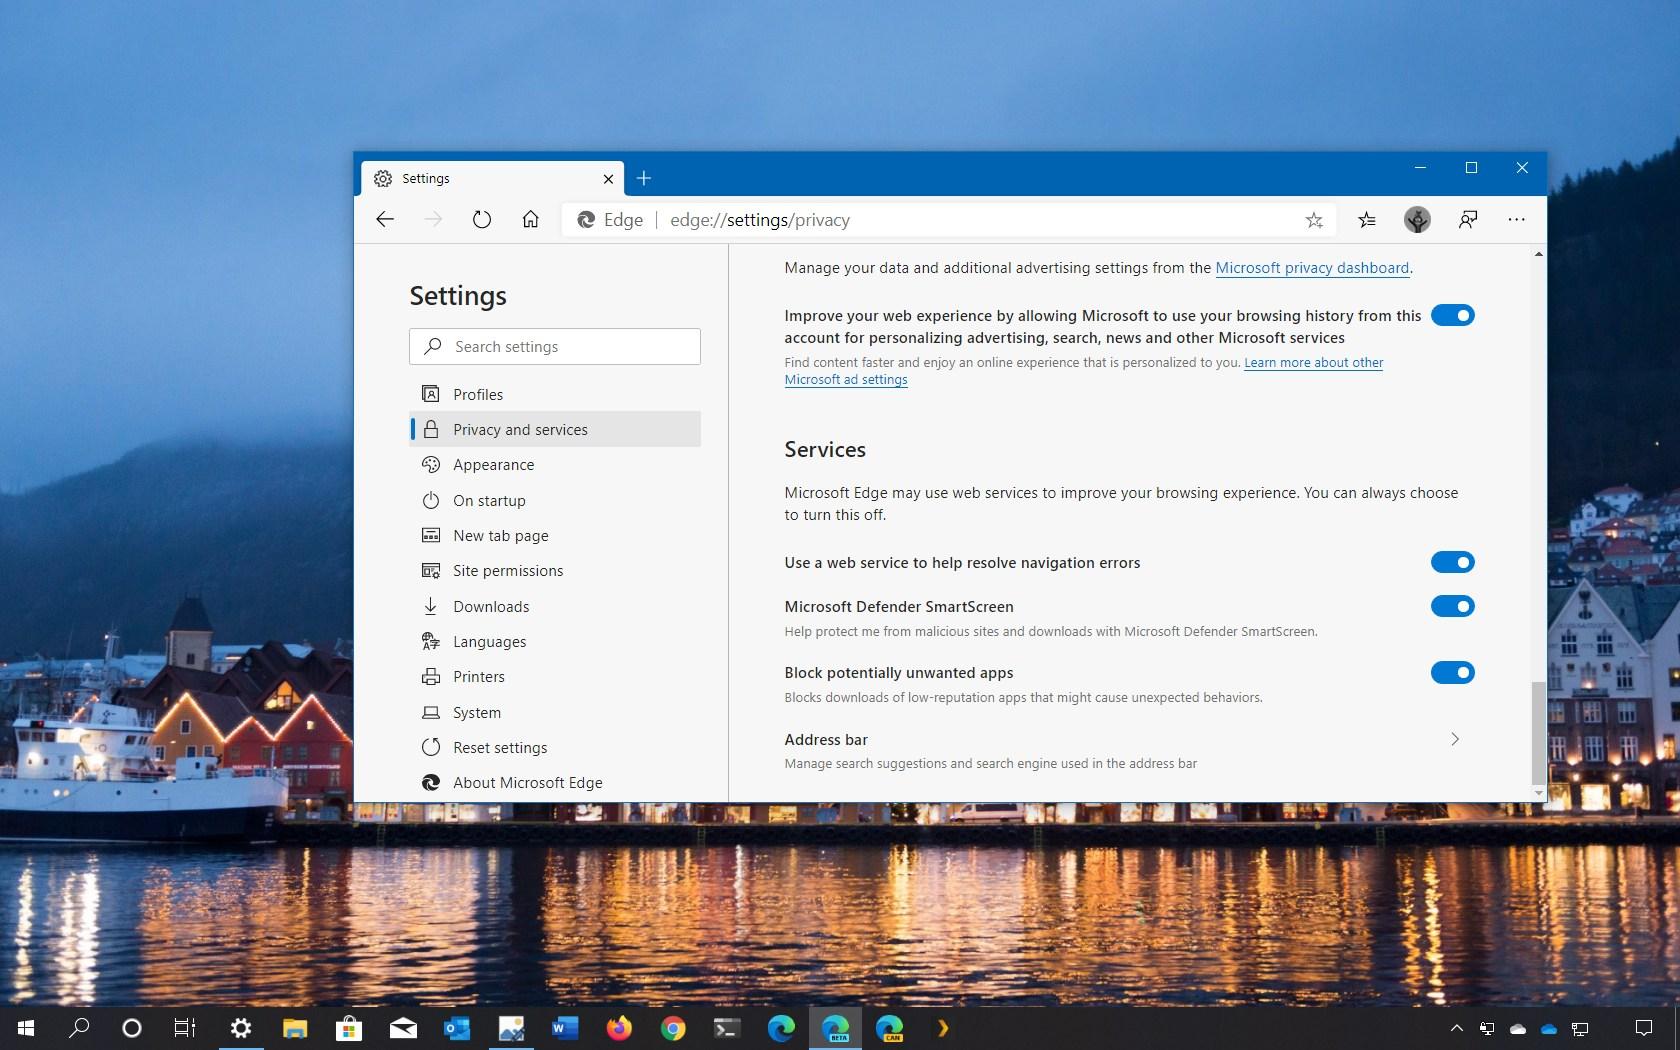 Microsoft Edge Chromium block potentially unwanted apps downloads